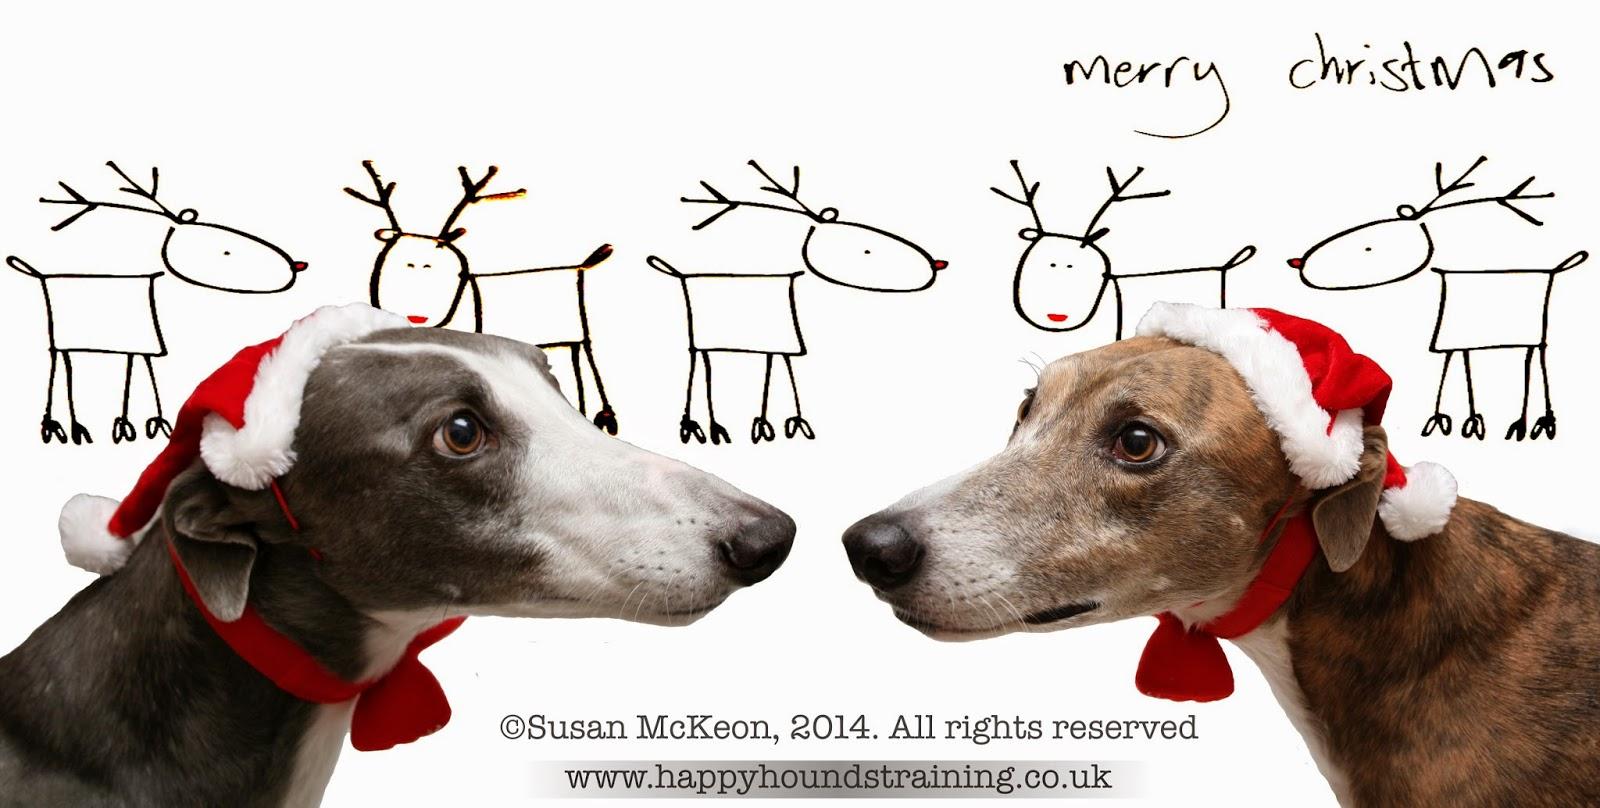 Image@ Two greyhounds wearing Christmas hats.